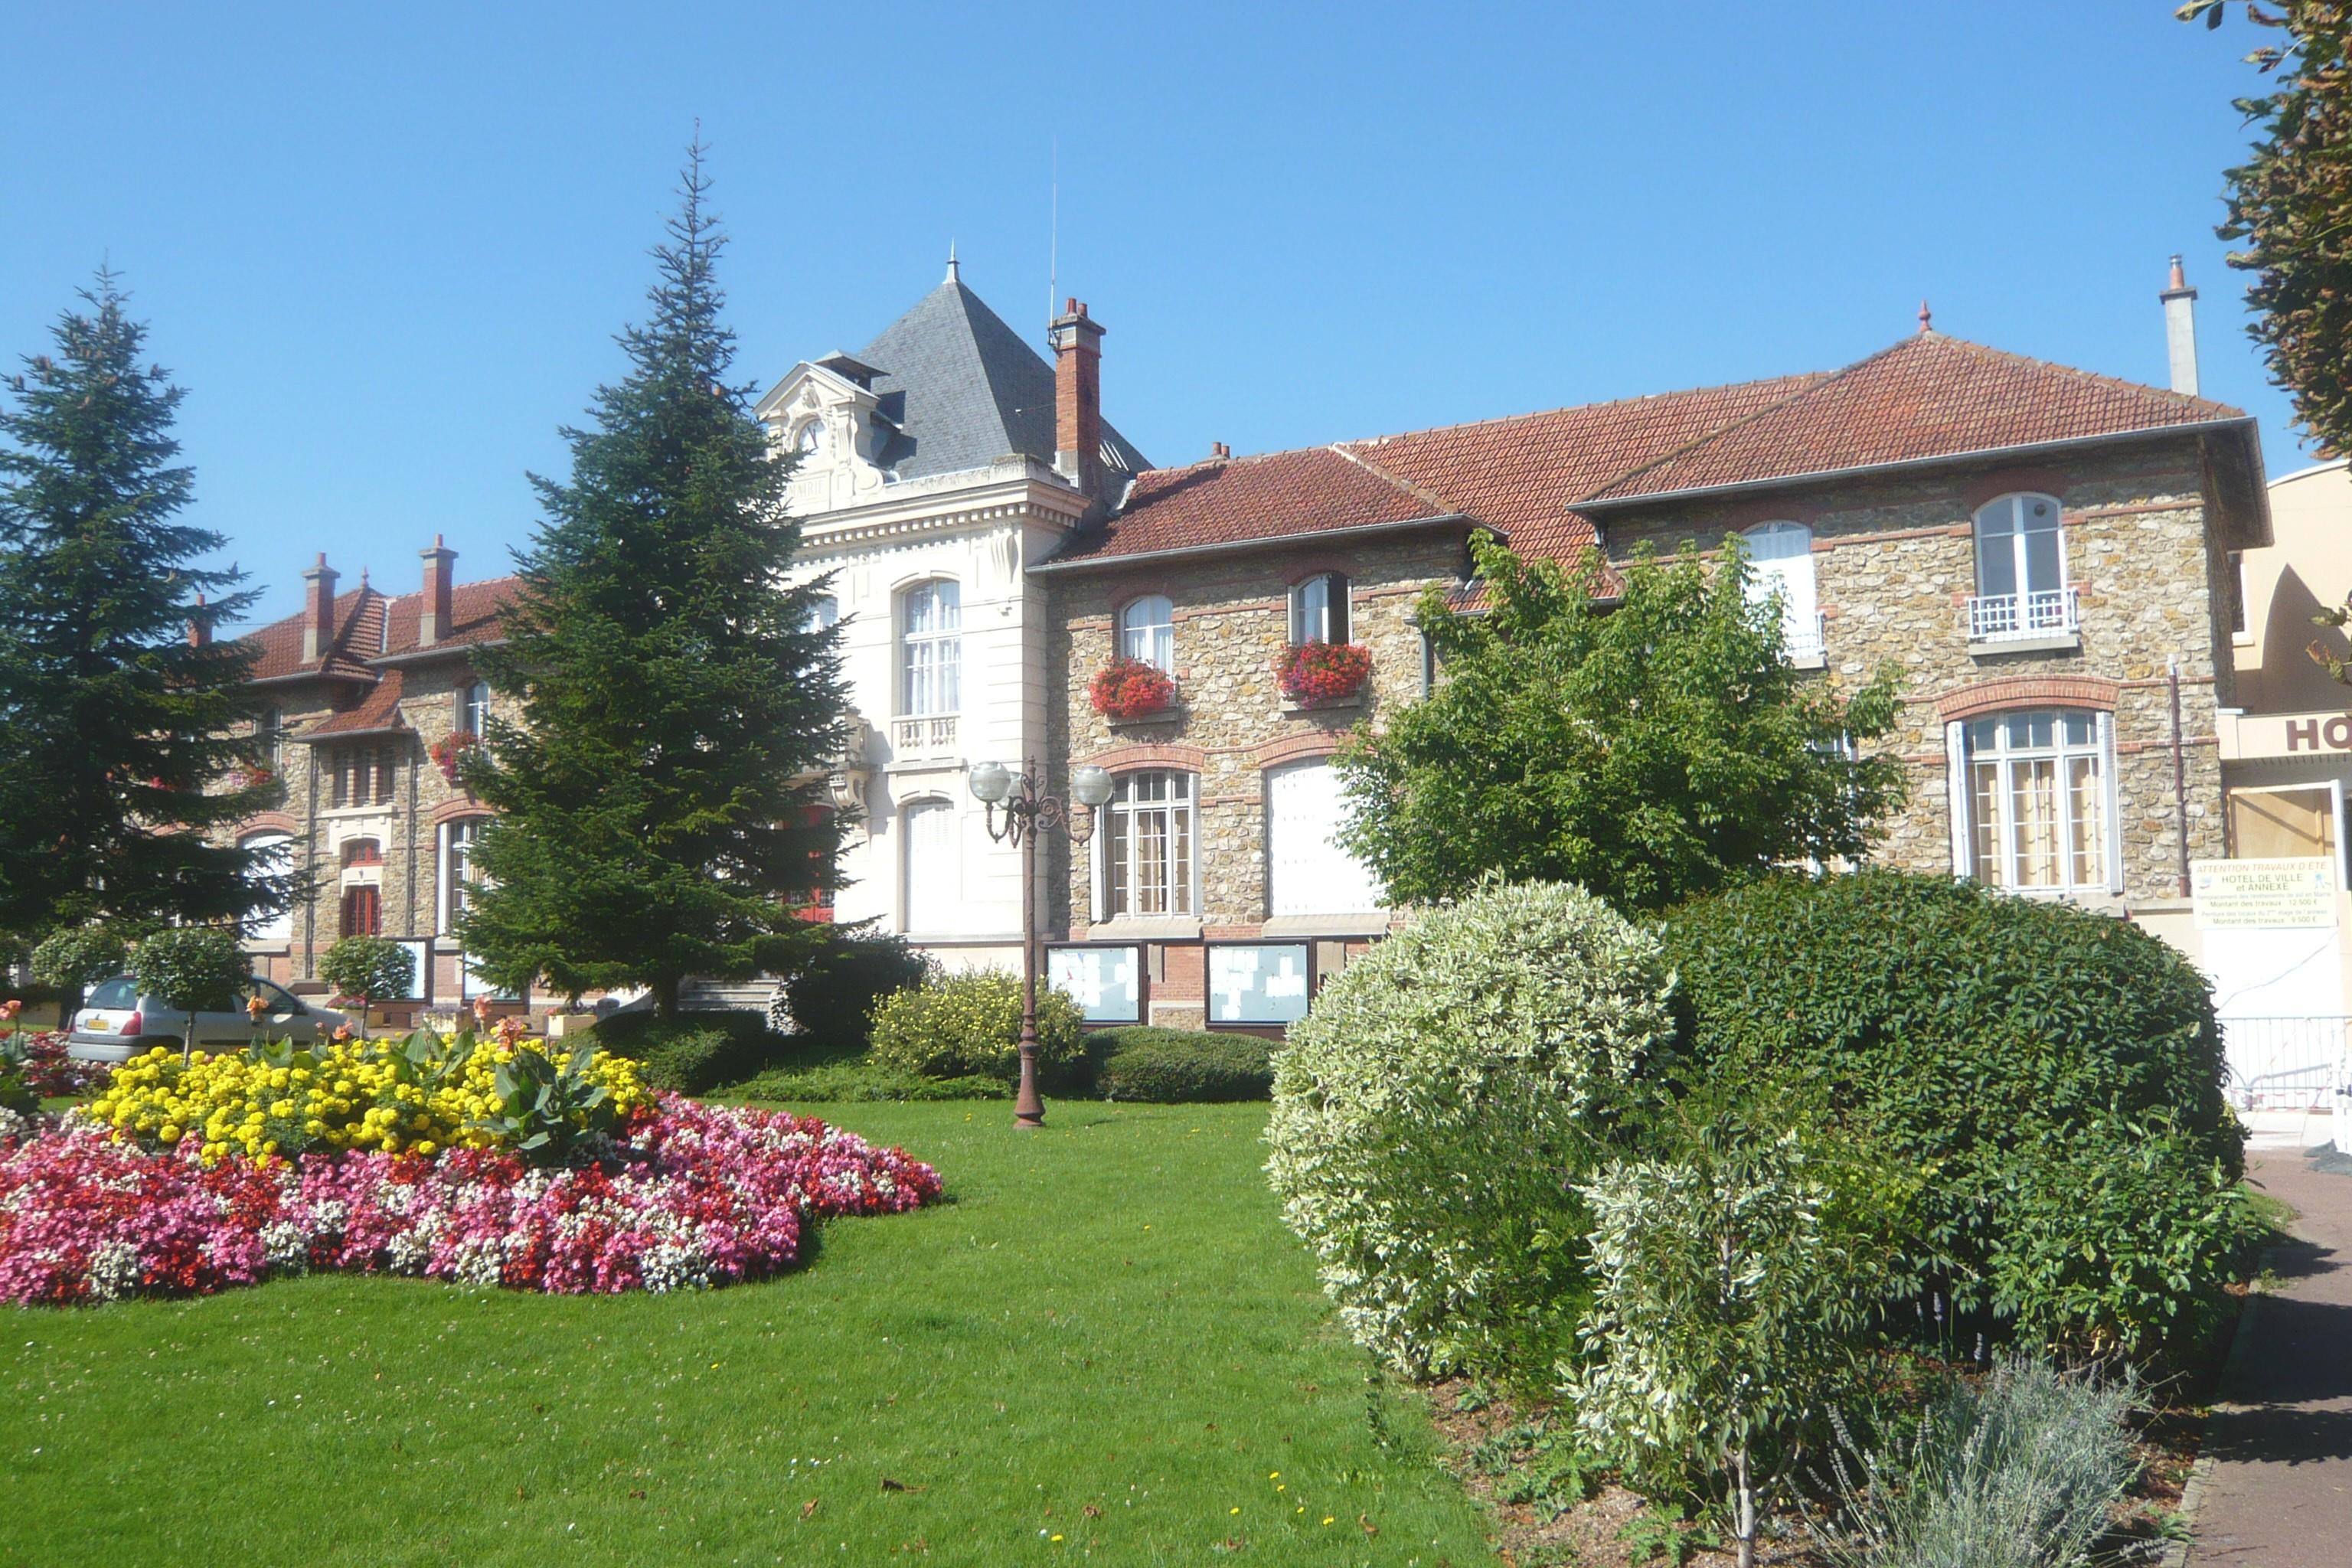 Morsang-sur-Orge